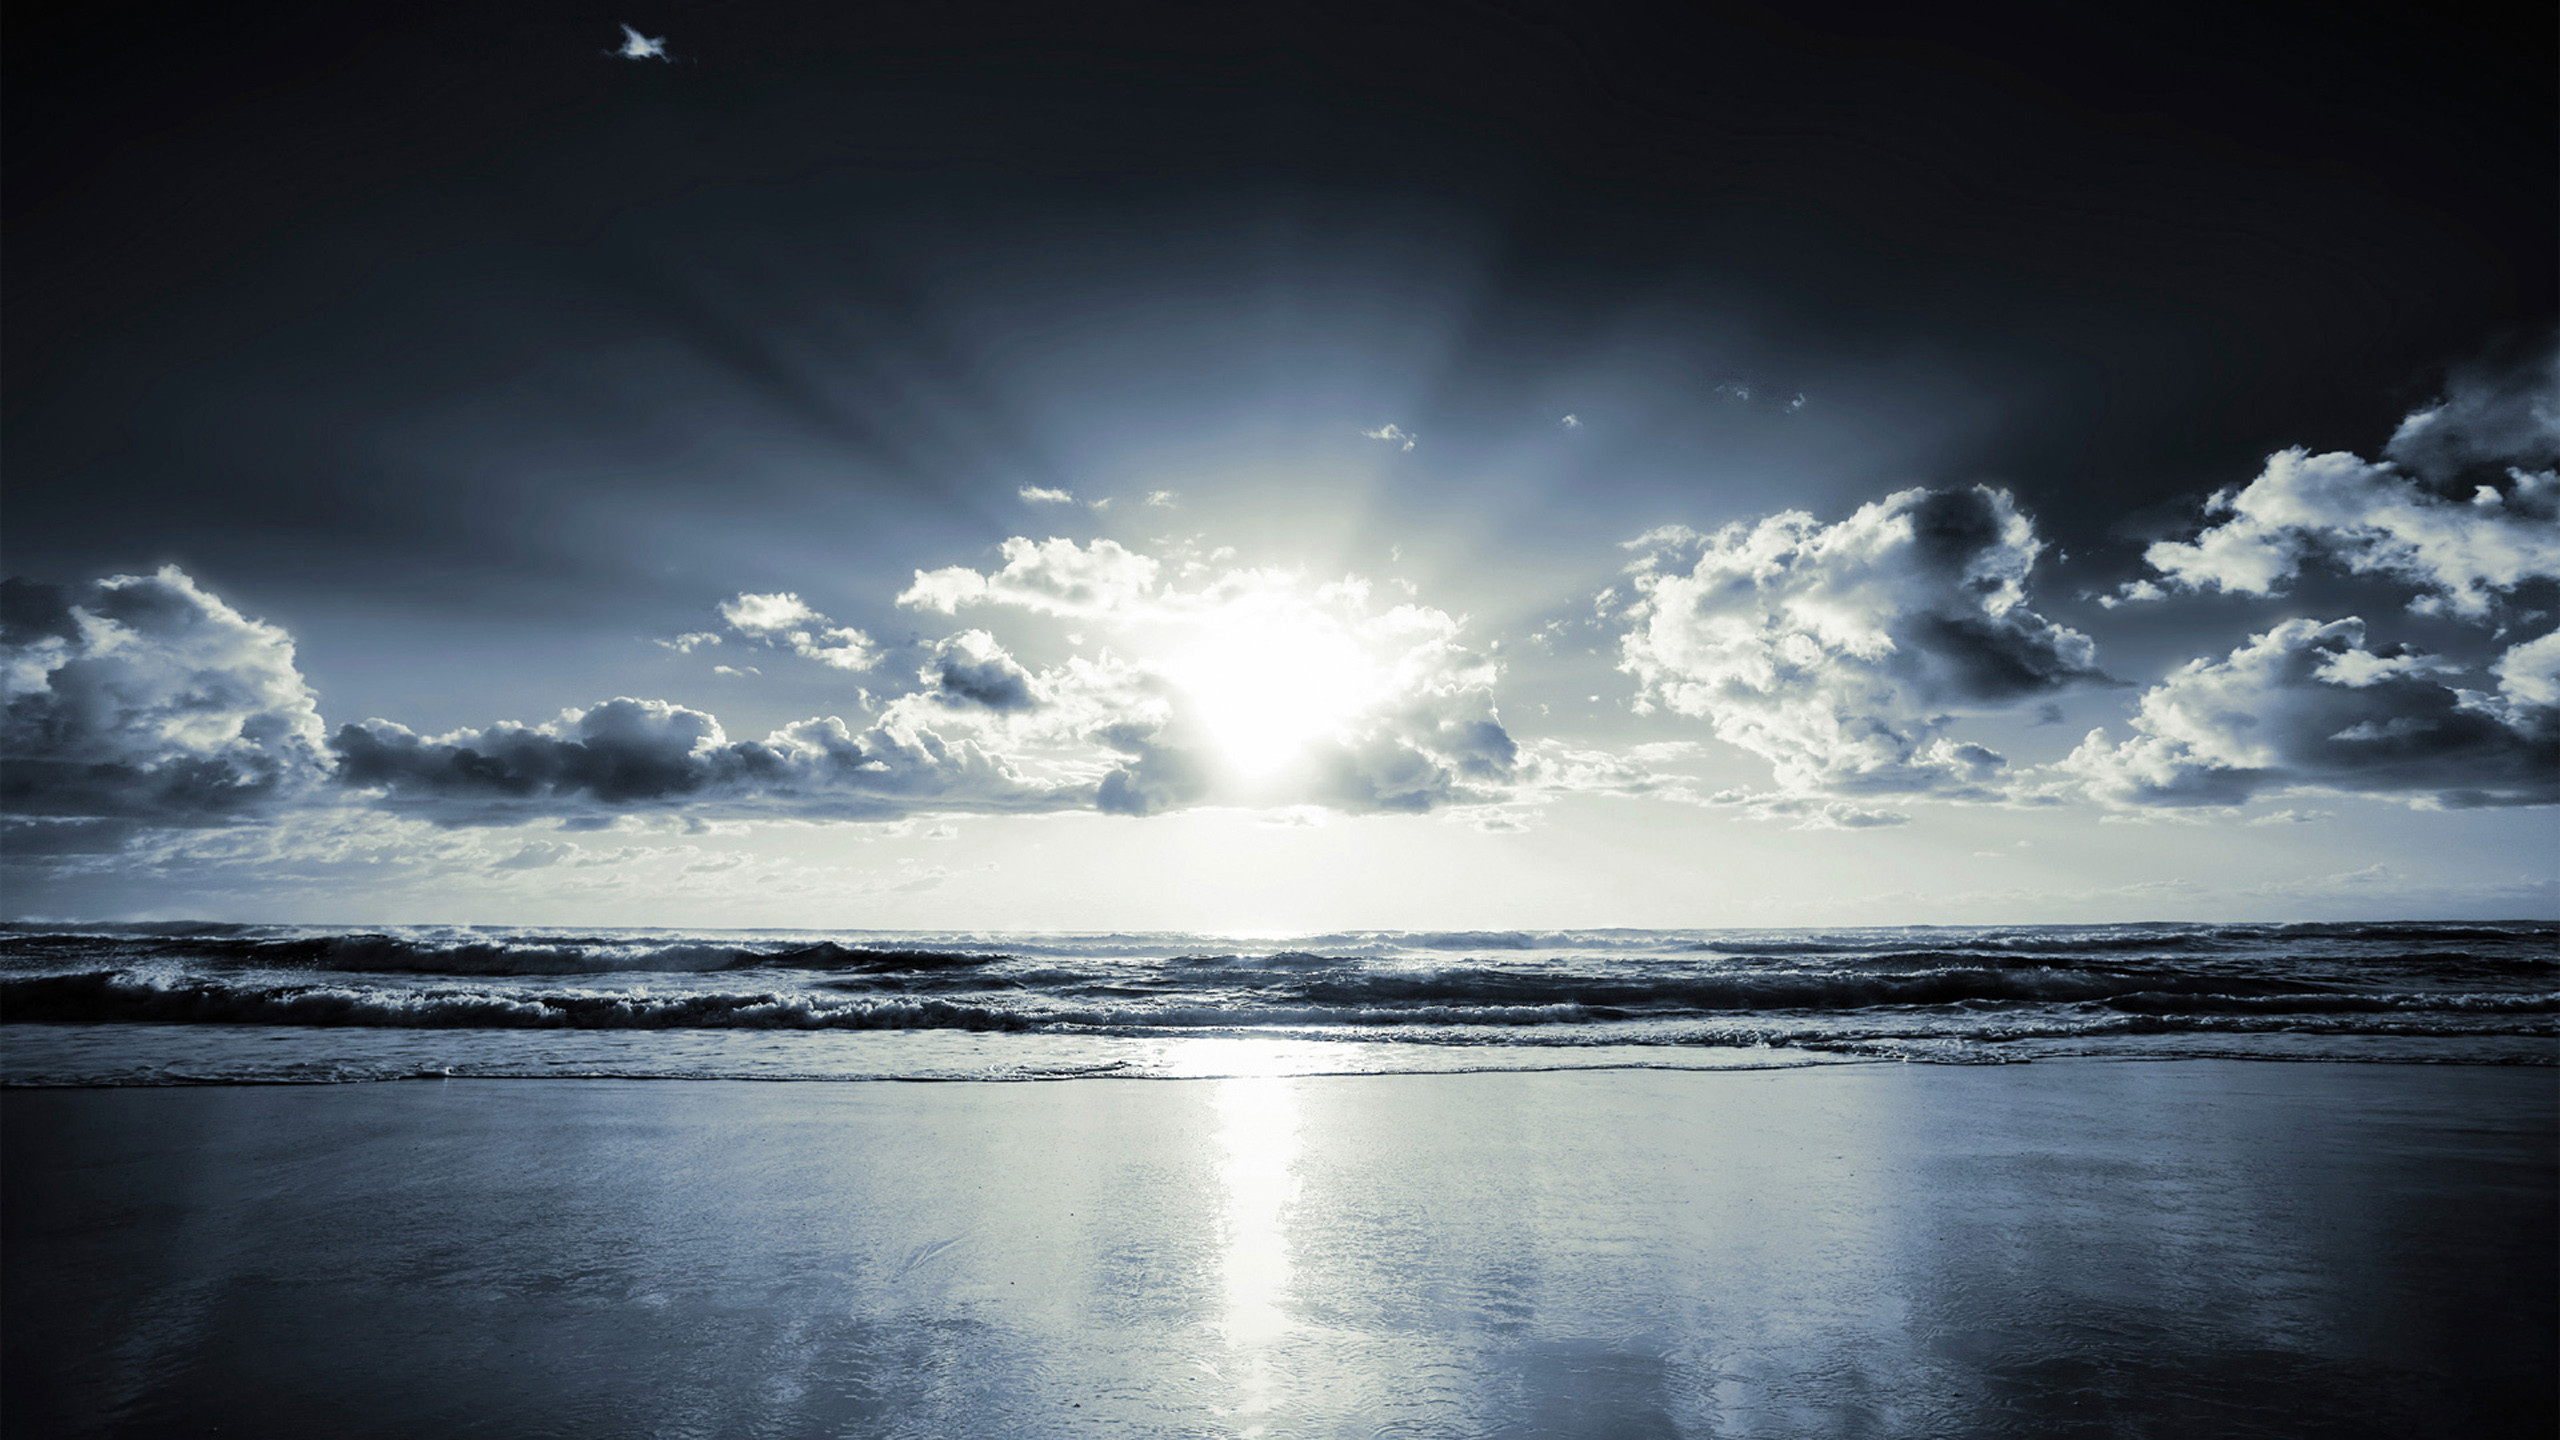 Res: 2560x1440, Sunbeams on sea wallpaper HD.